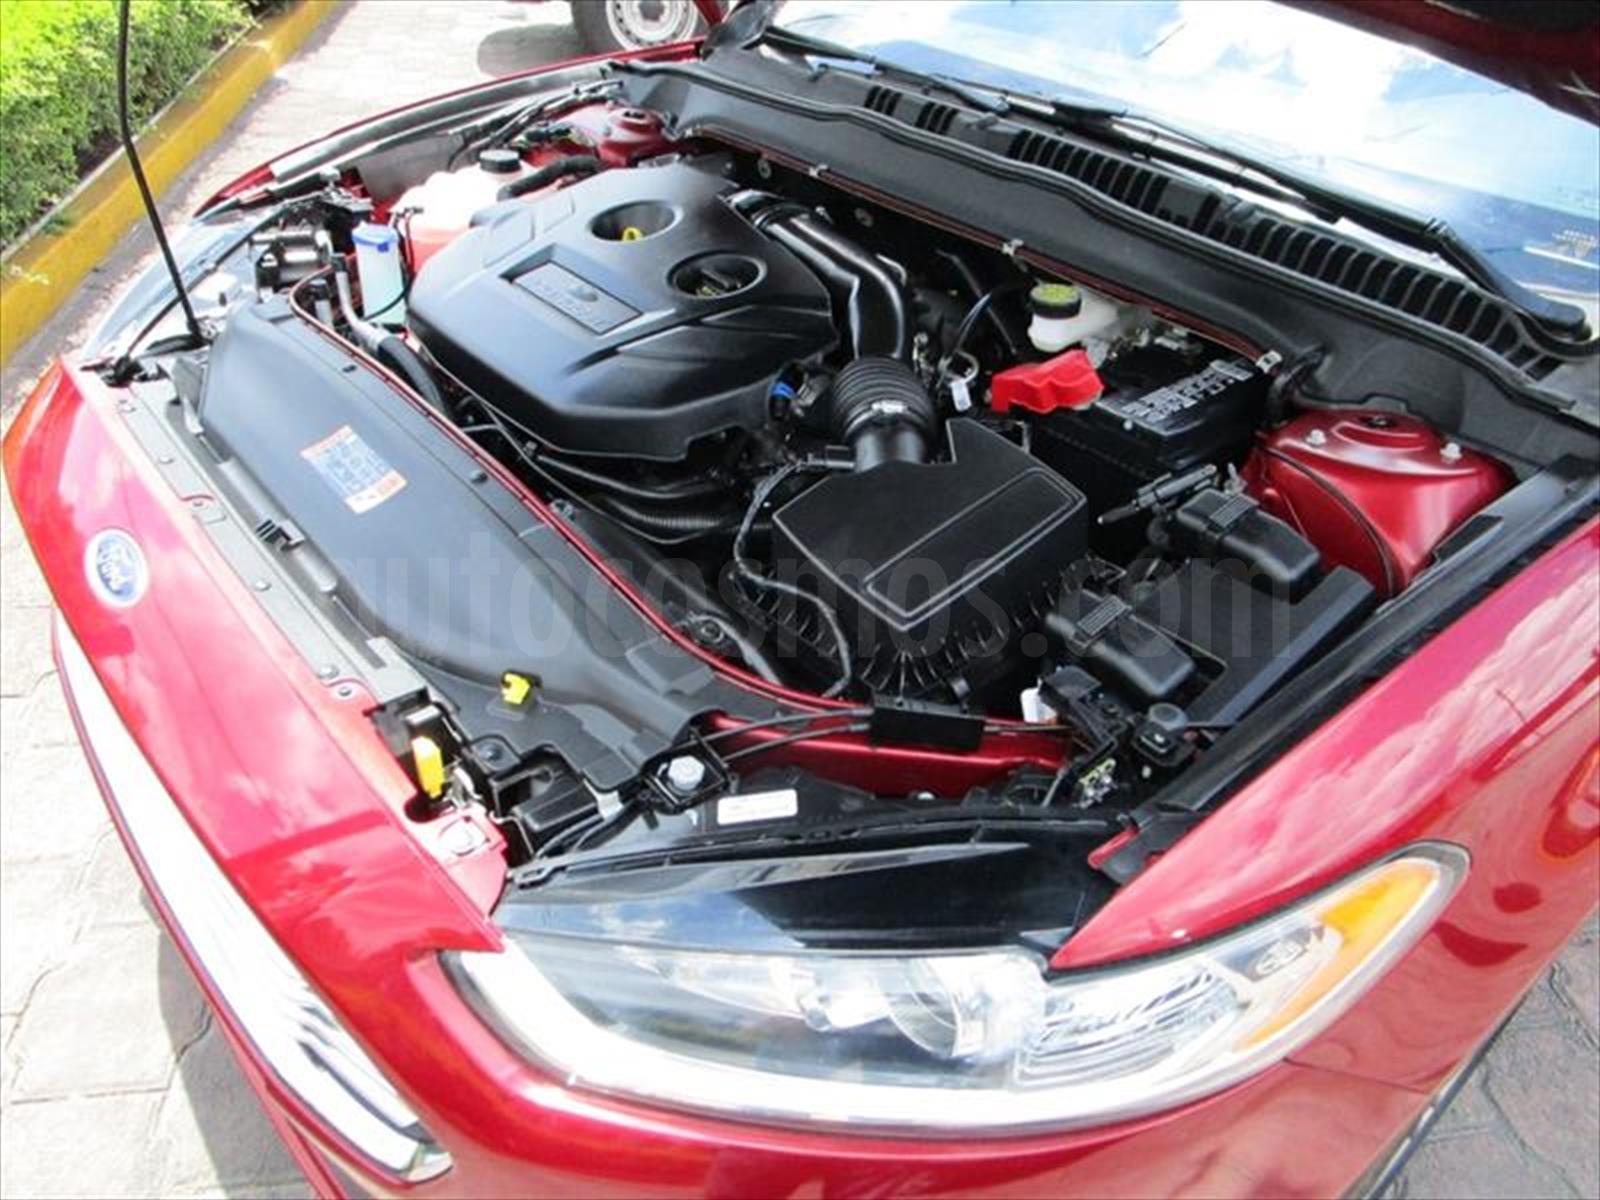 Venta autos usado - Estado de Mexico - Ford Fusion SE